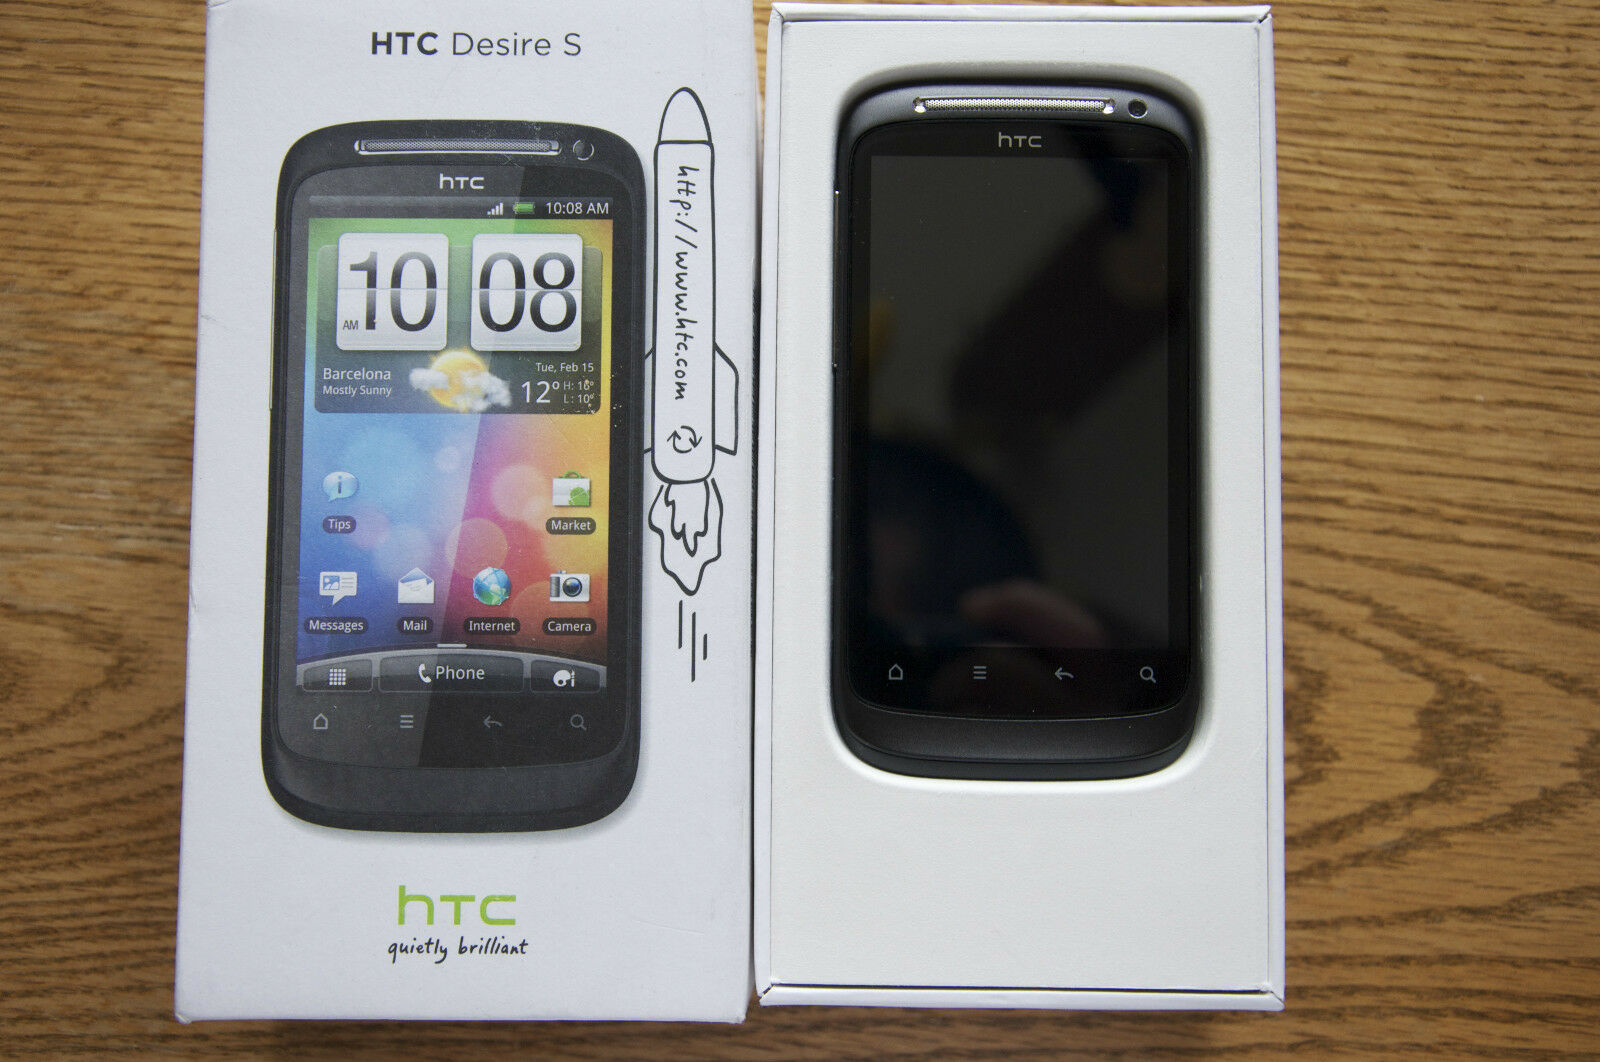 htc desire s 1 1gb black unlocked smartphone ebay rh ebay com HTC One V HTC Desiree